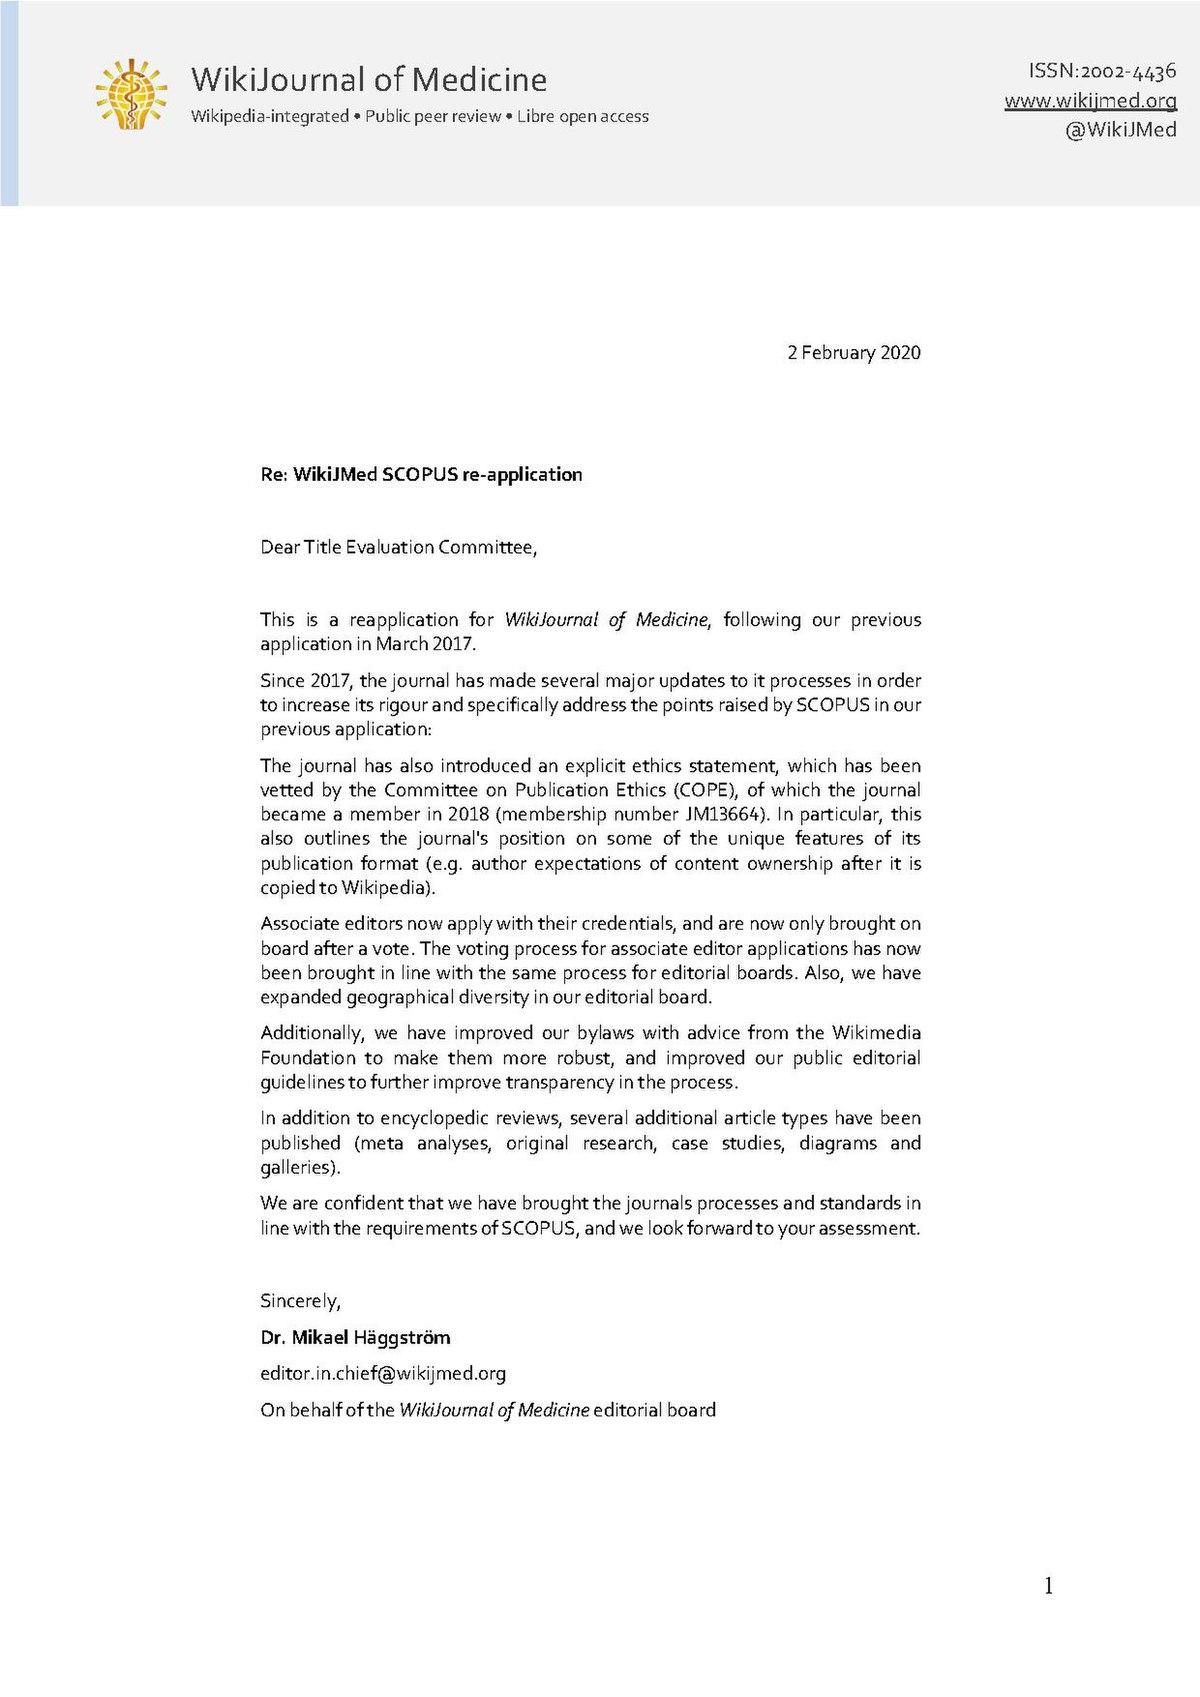 File:WikiJMed SCOPUS cover letter.pdf - Wikimedia Commons